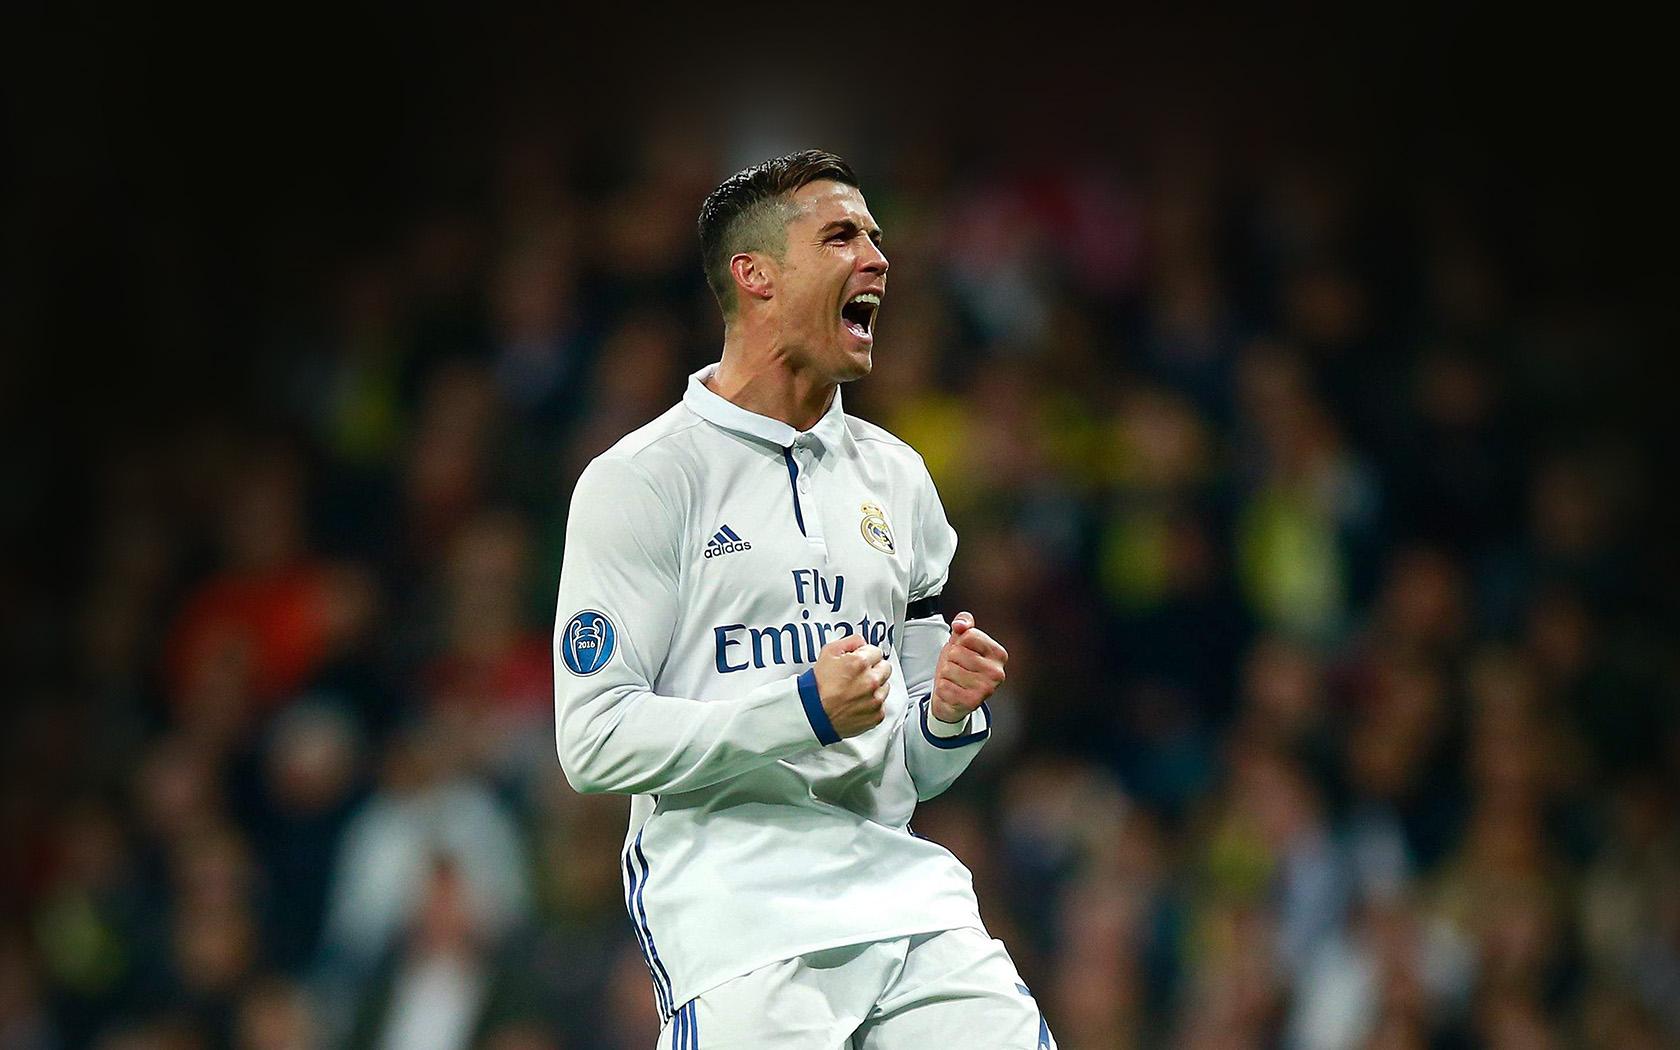 Hm22-c-ronaldo-soccer-real-madrid-sports-wallpaper